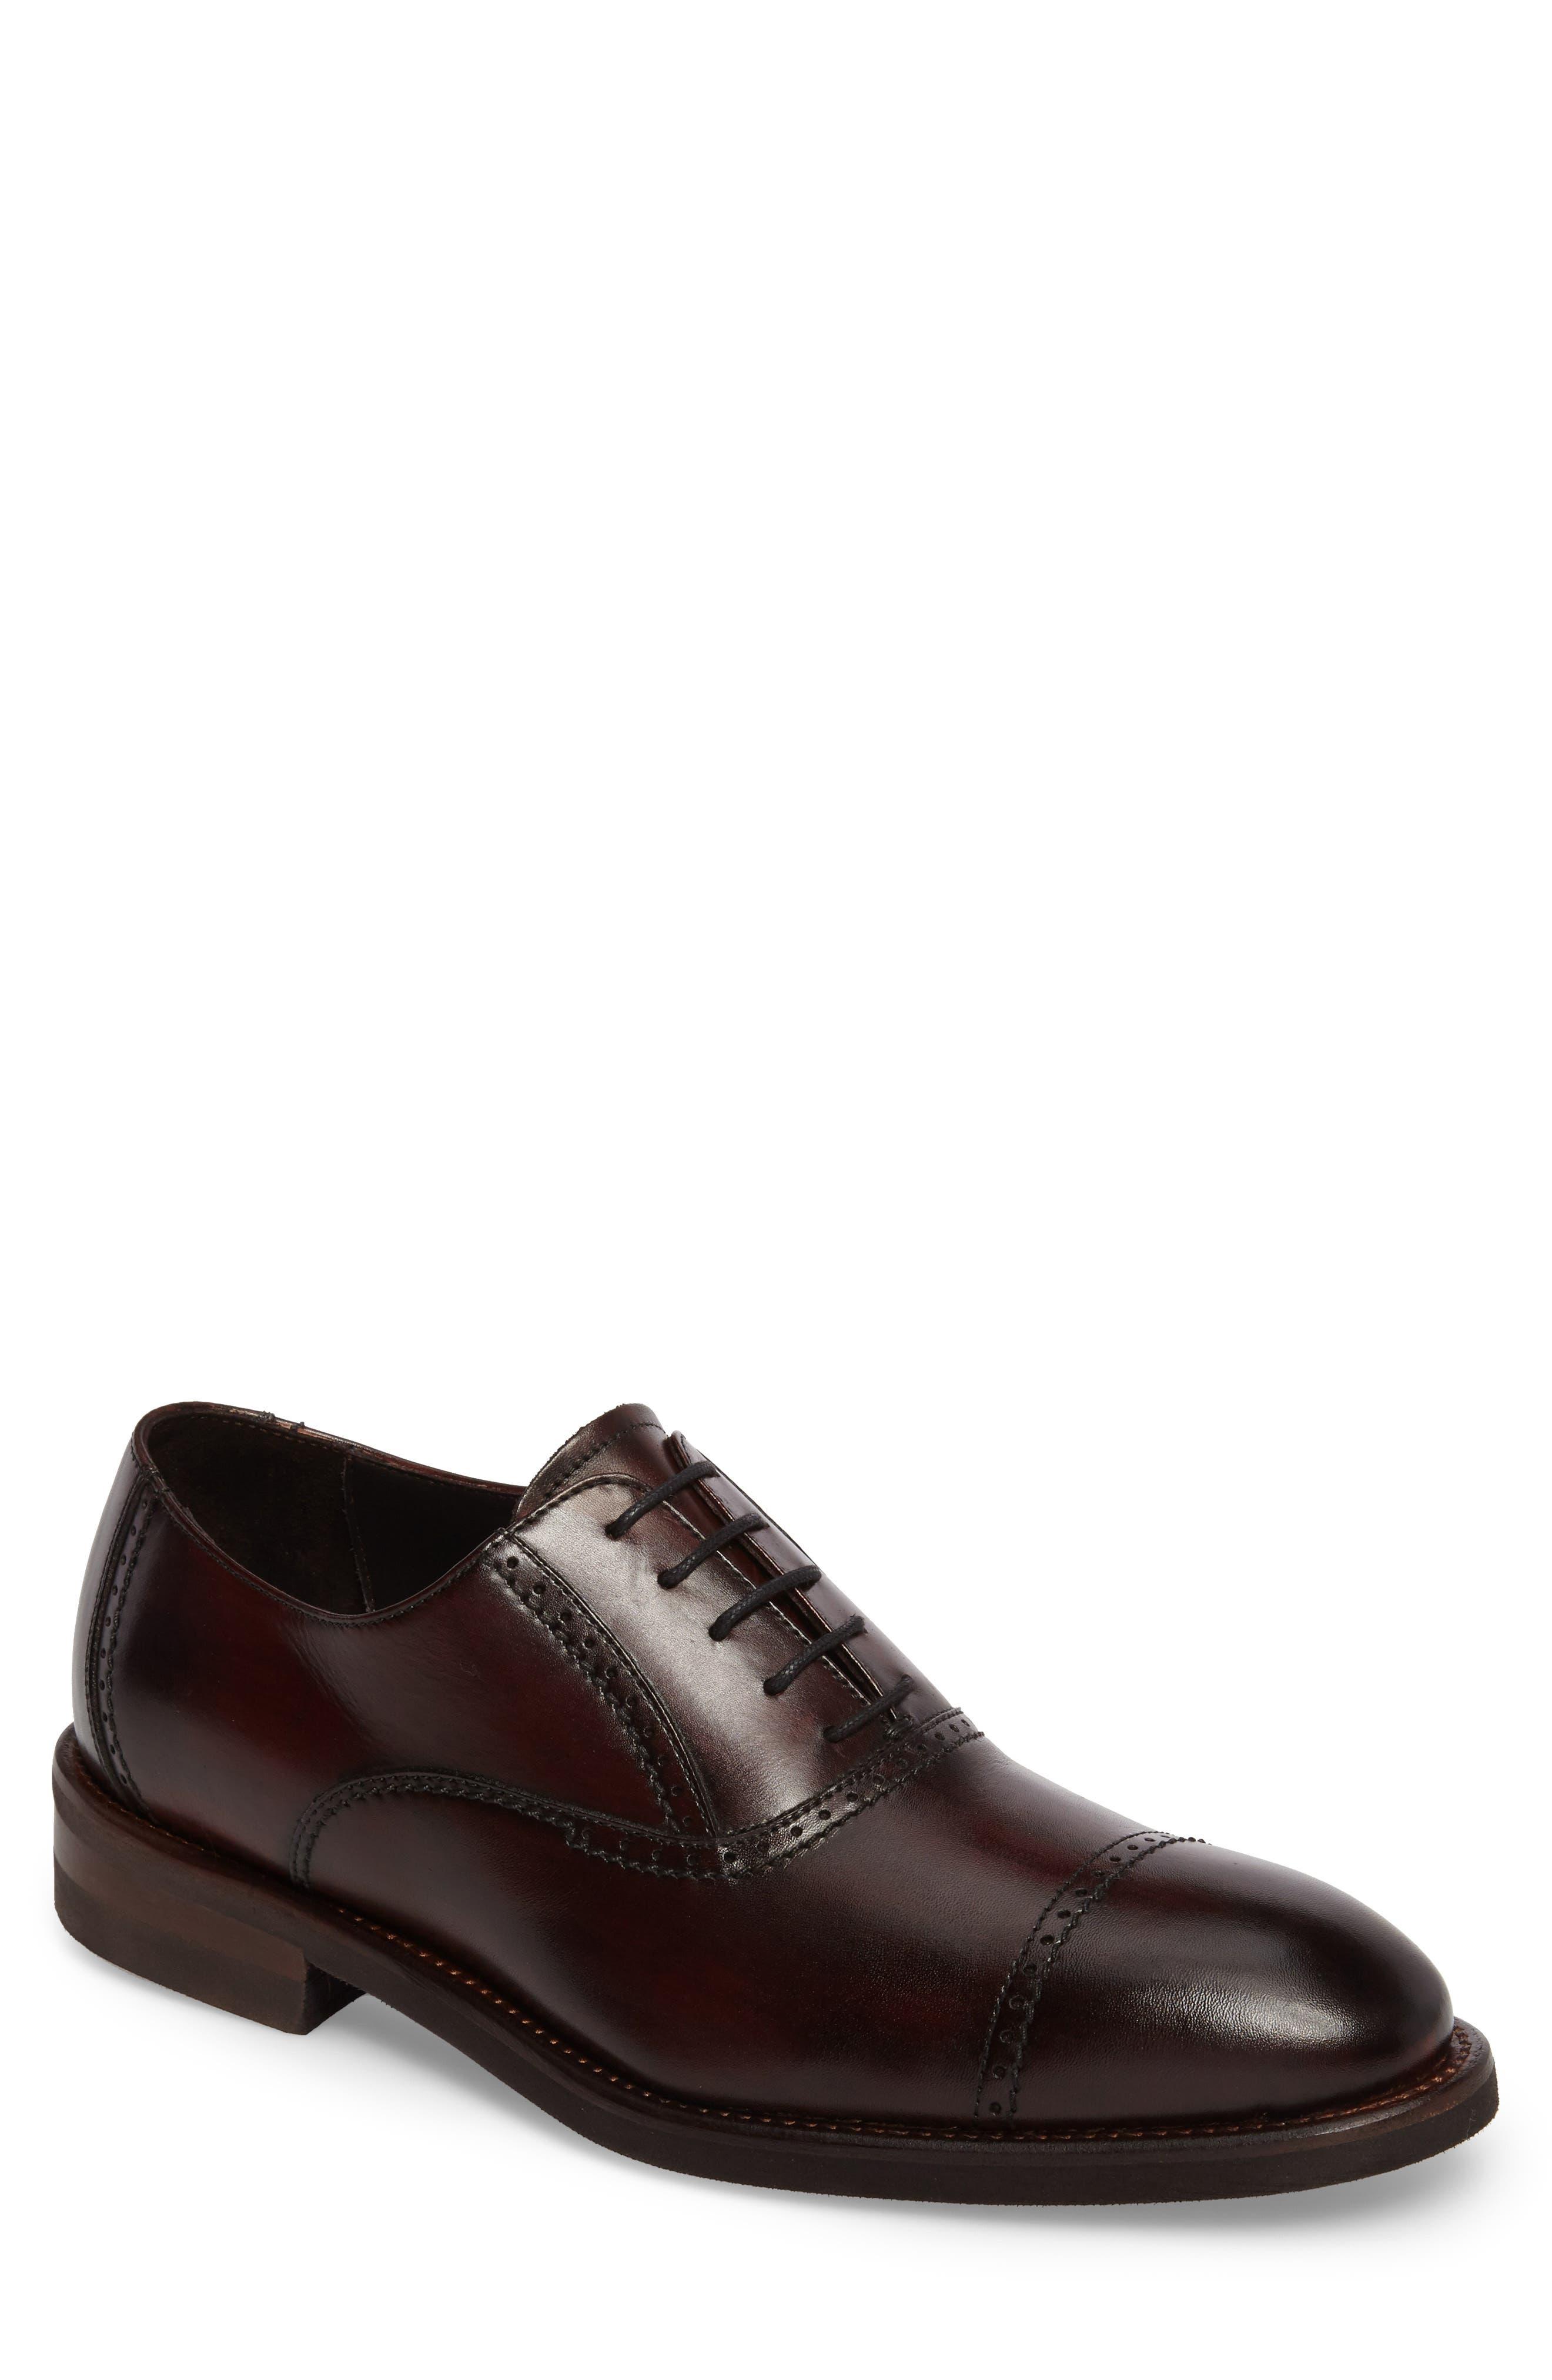 Borgo Cap Toe Oxford,                         Main,                         color, Burgundy Leather